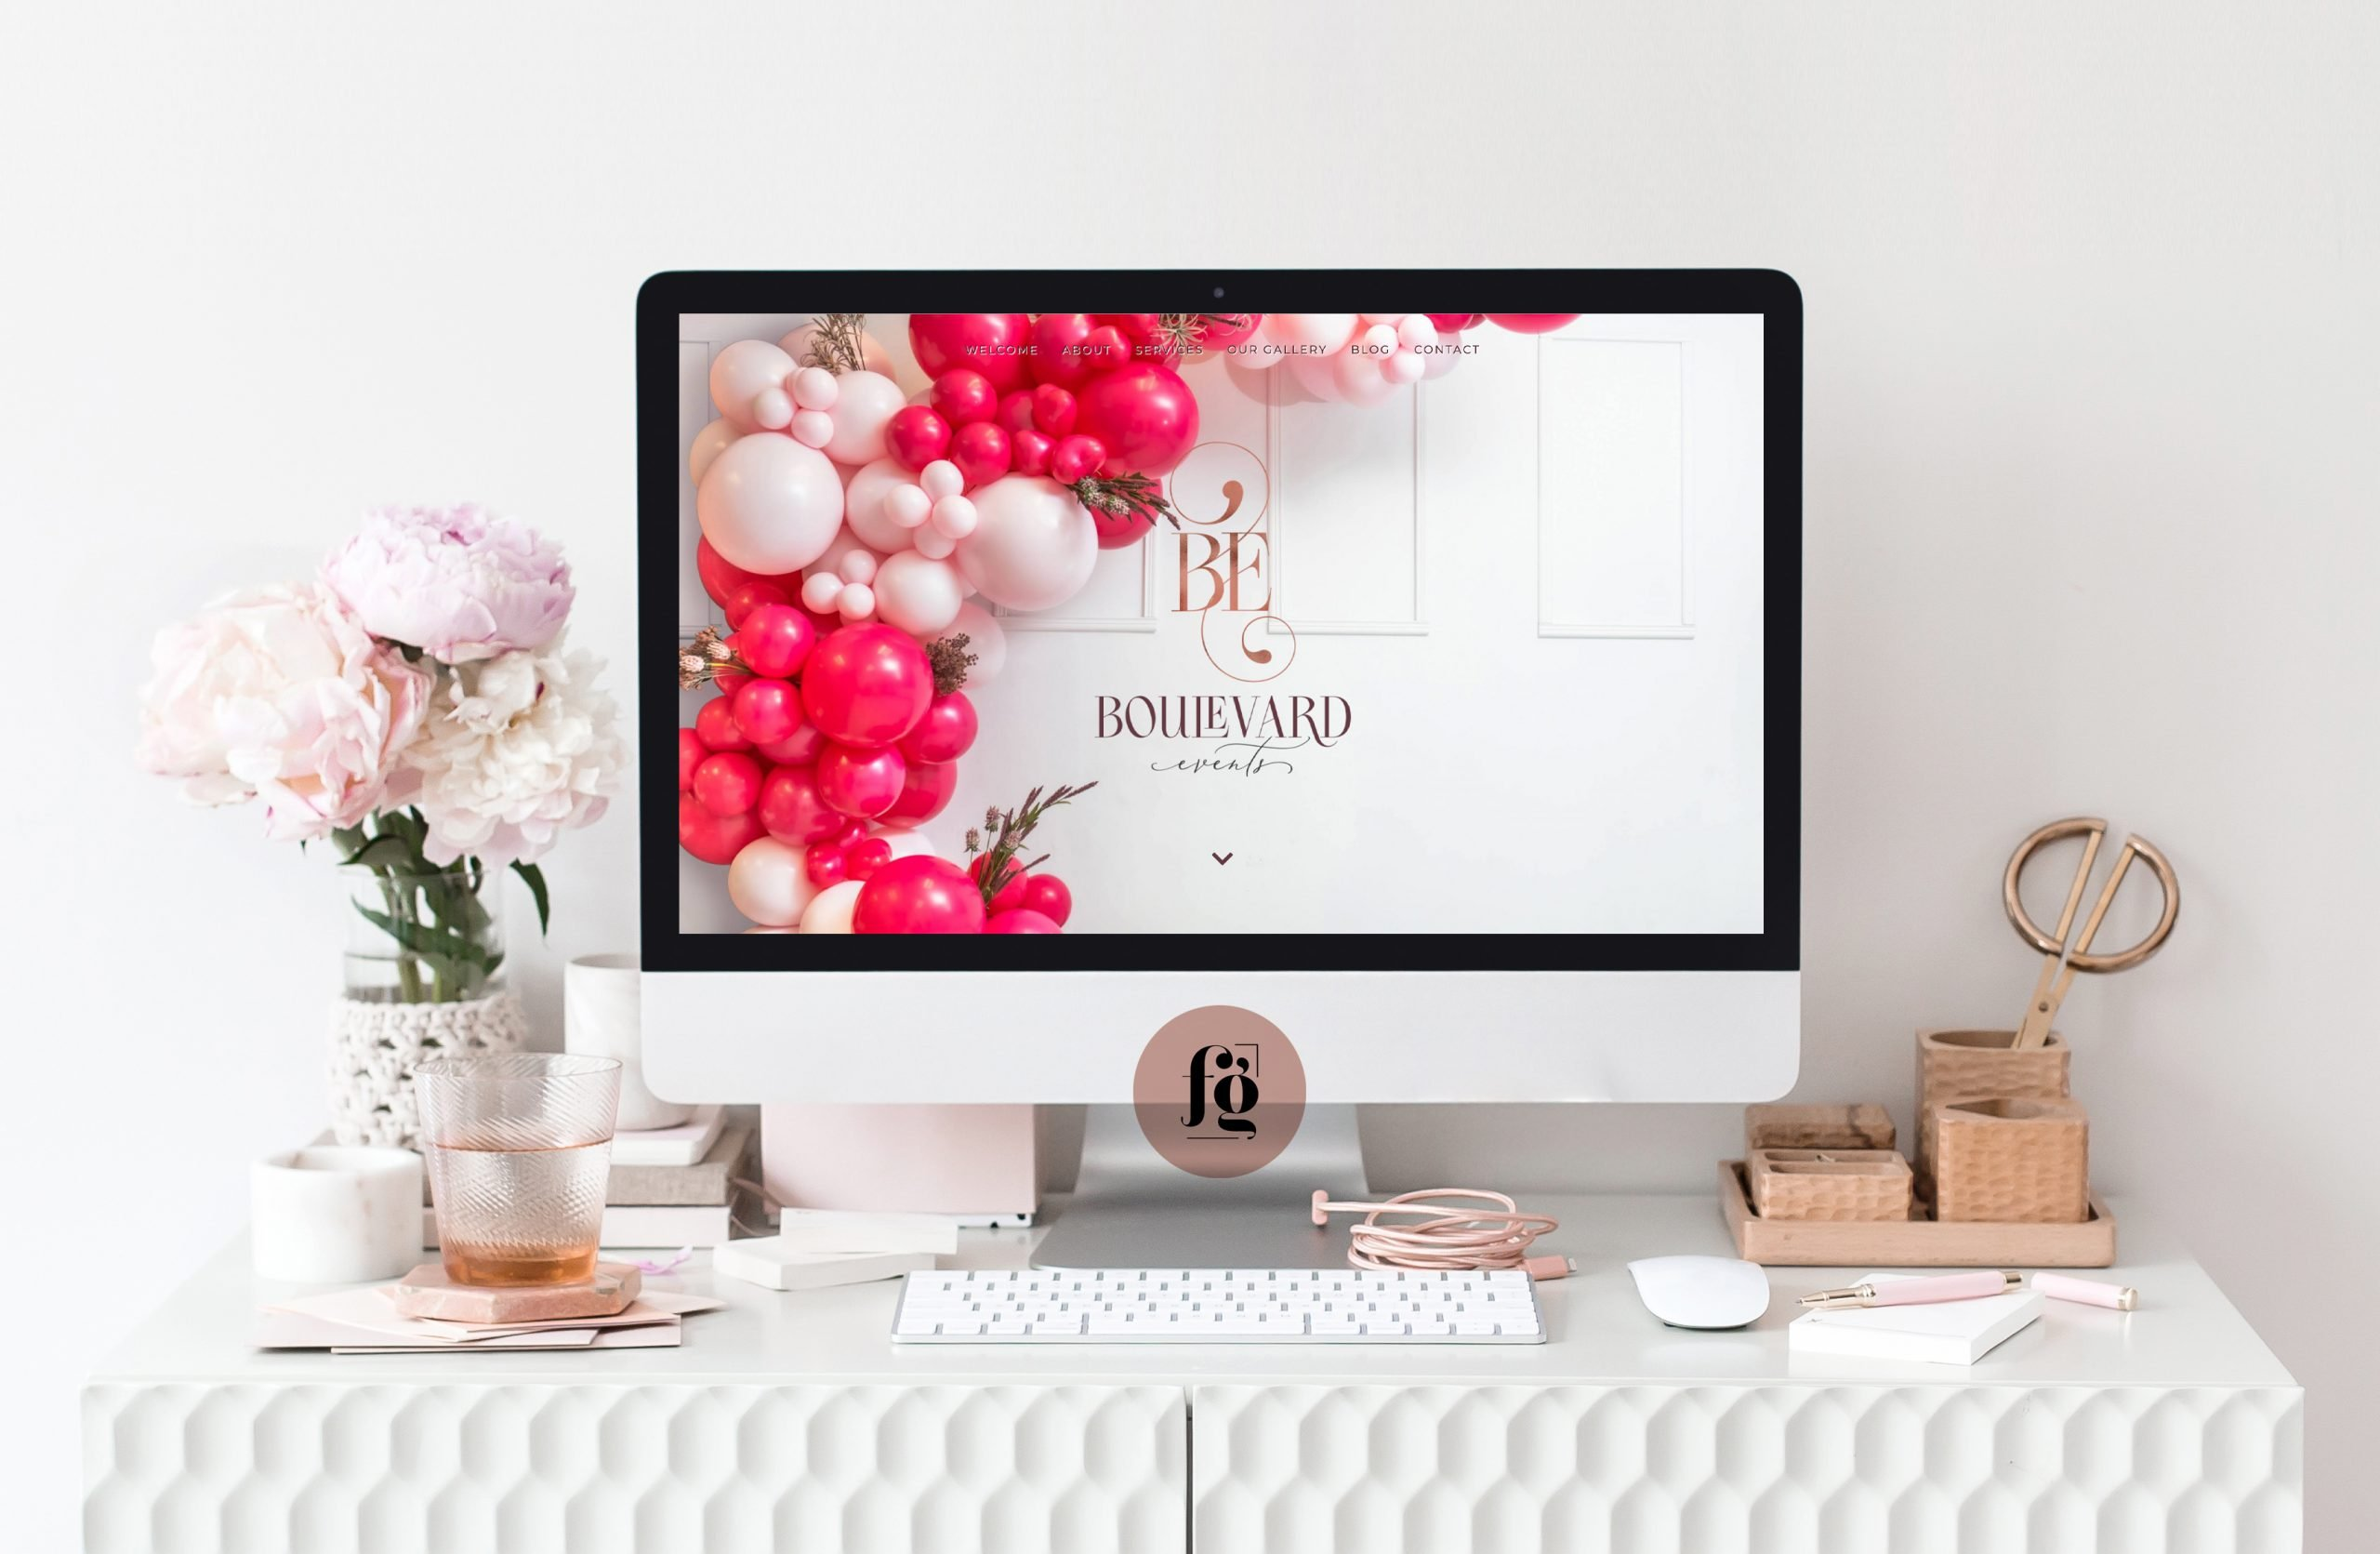 website semi-custom design for Boulevard Events